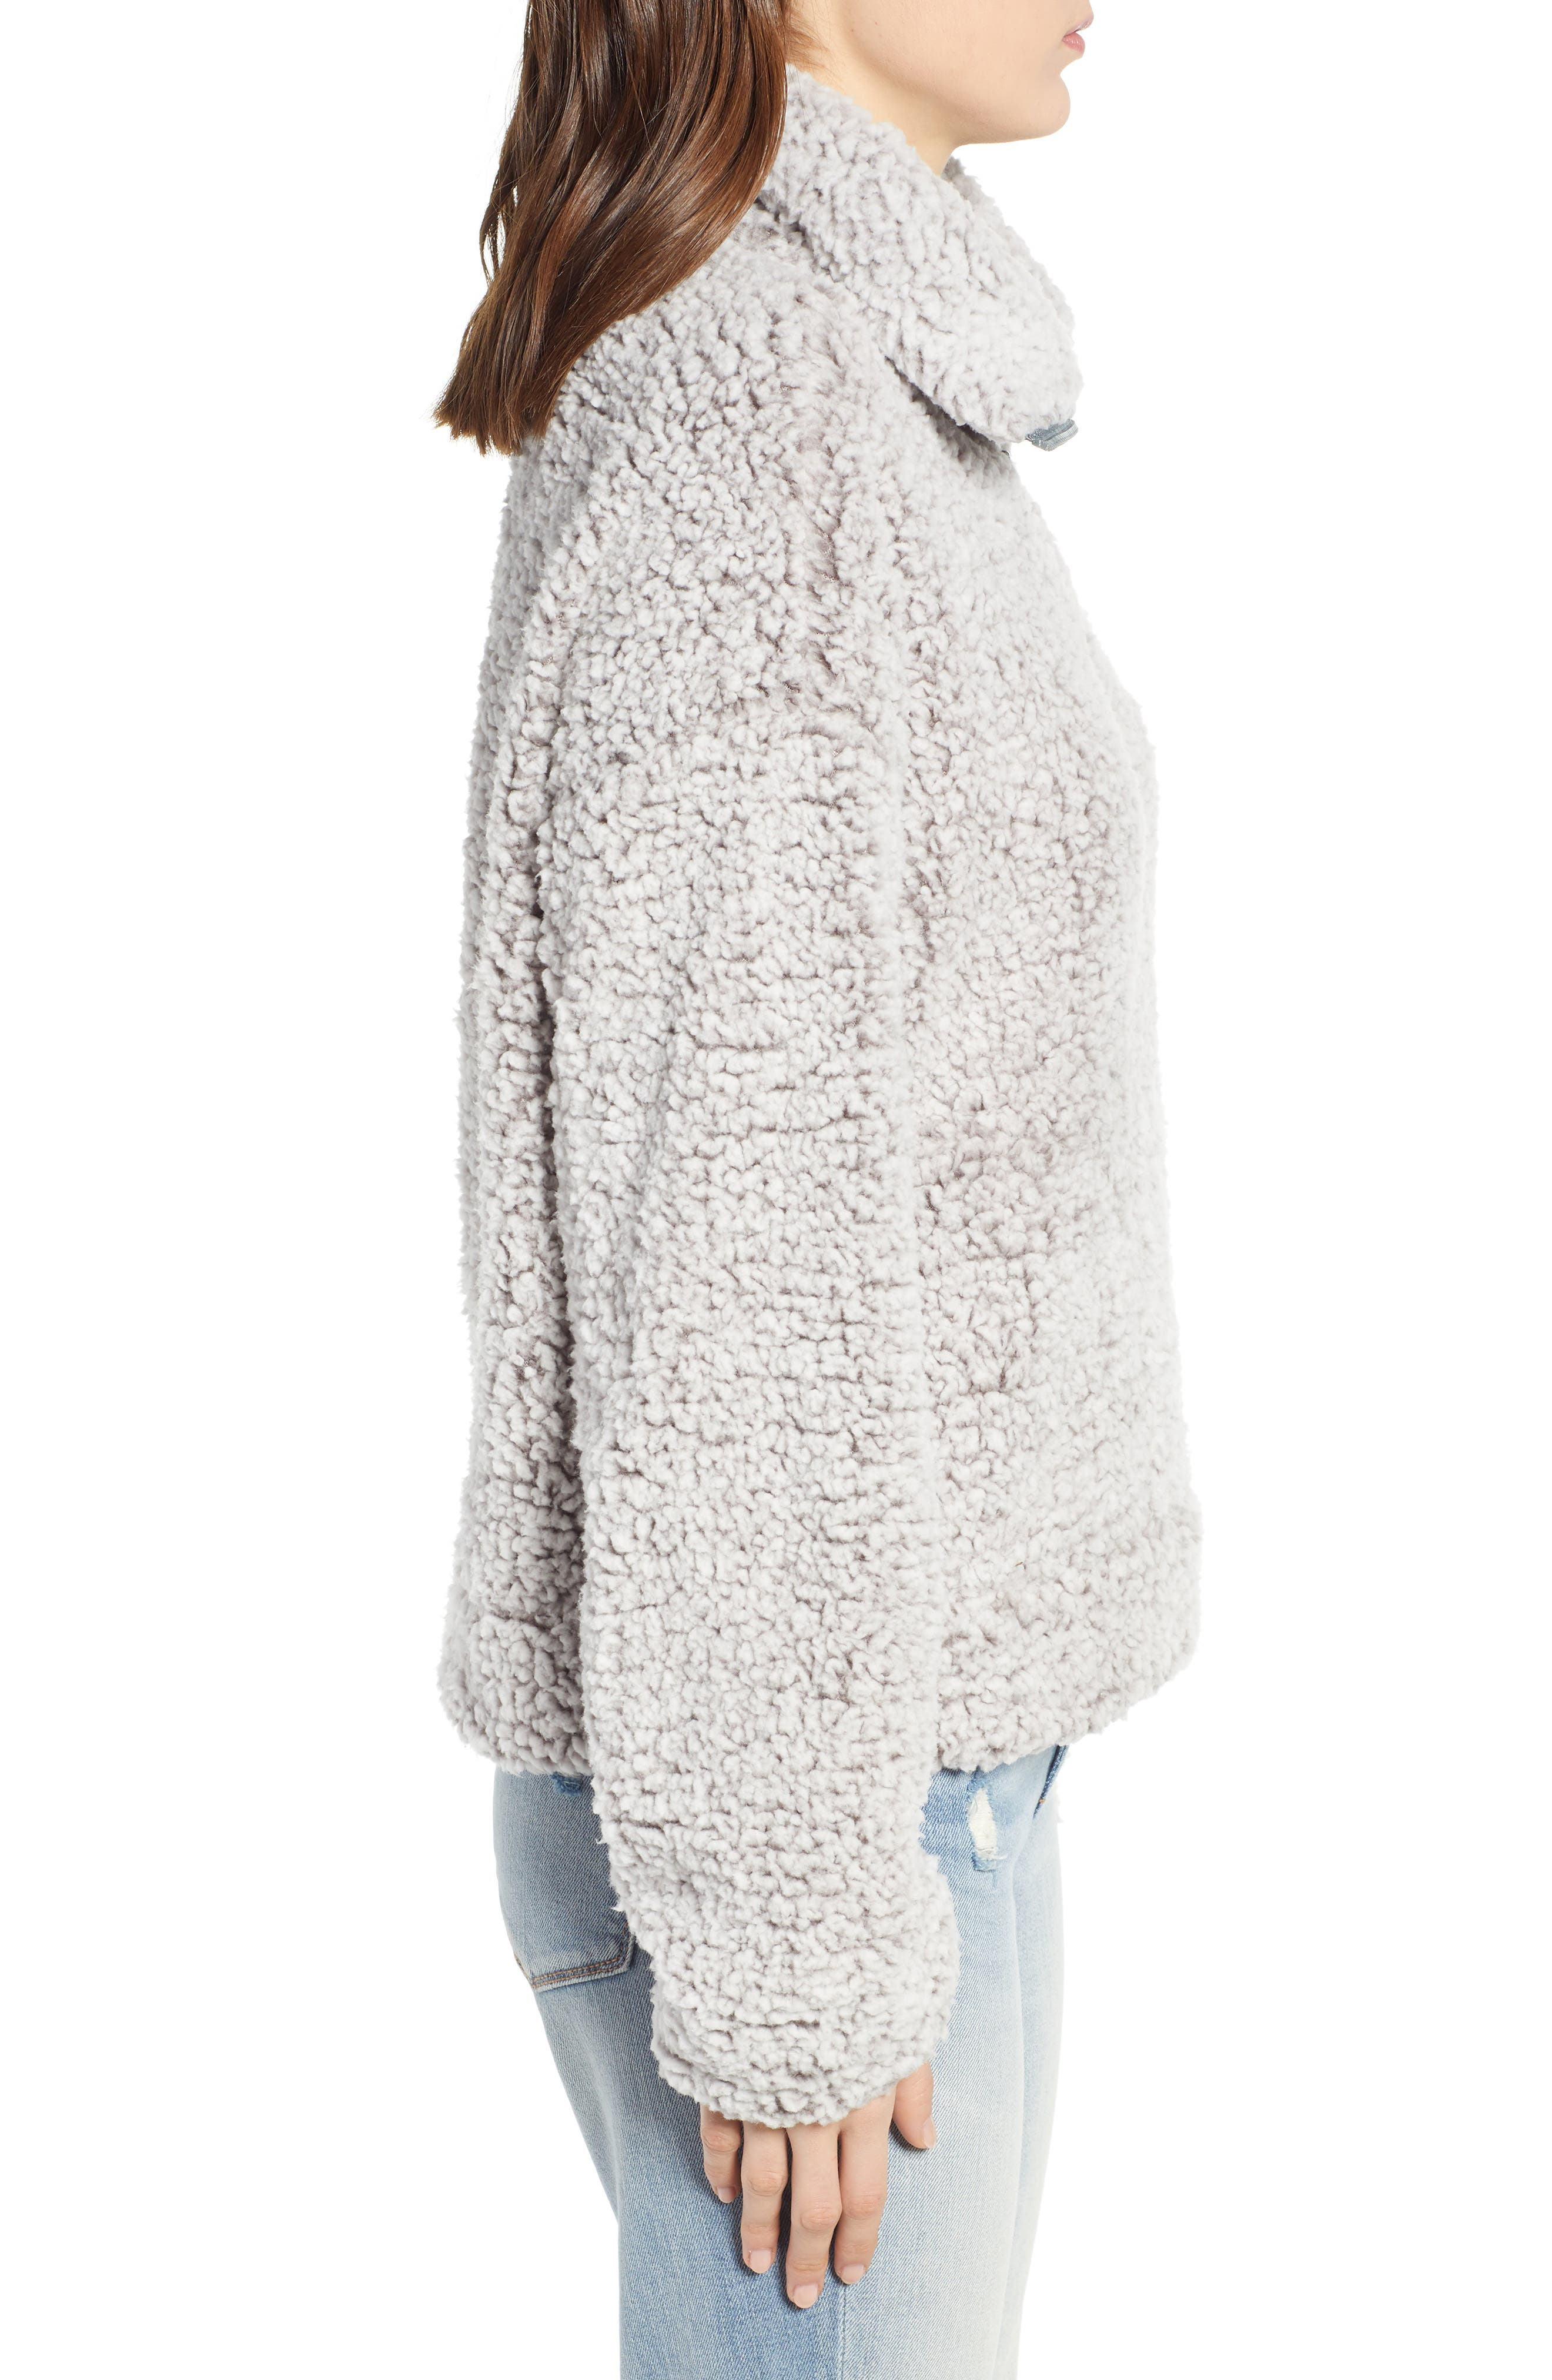 THREAD & SUPPLY, Quarter Zip Fleece Pullover, Alternate thumbnail 4, color, SILVER